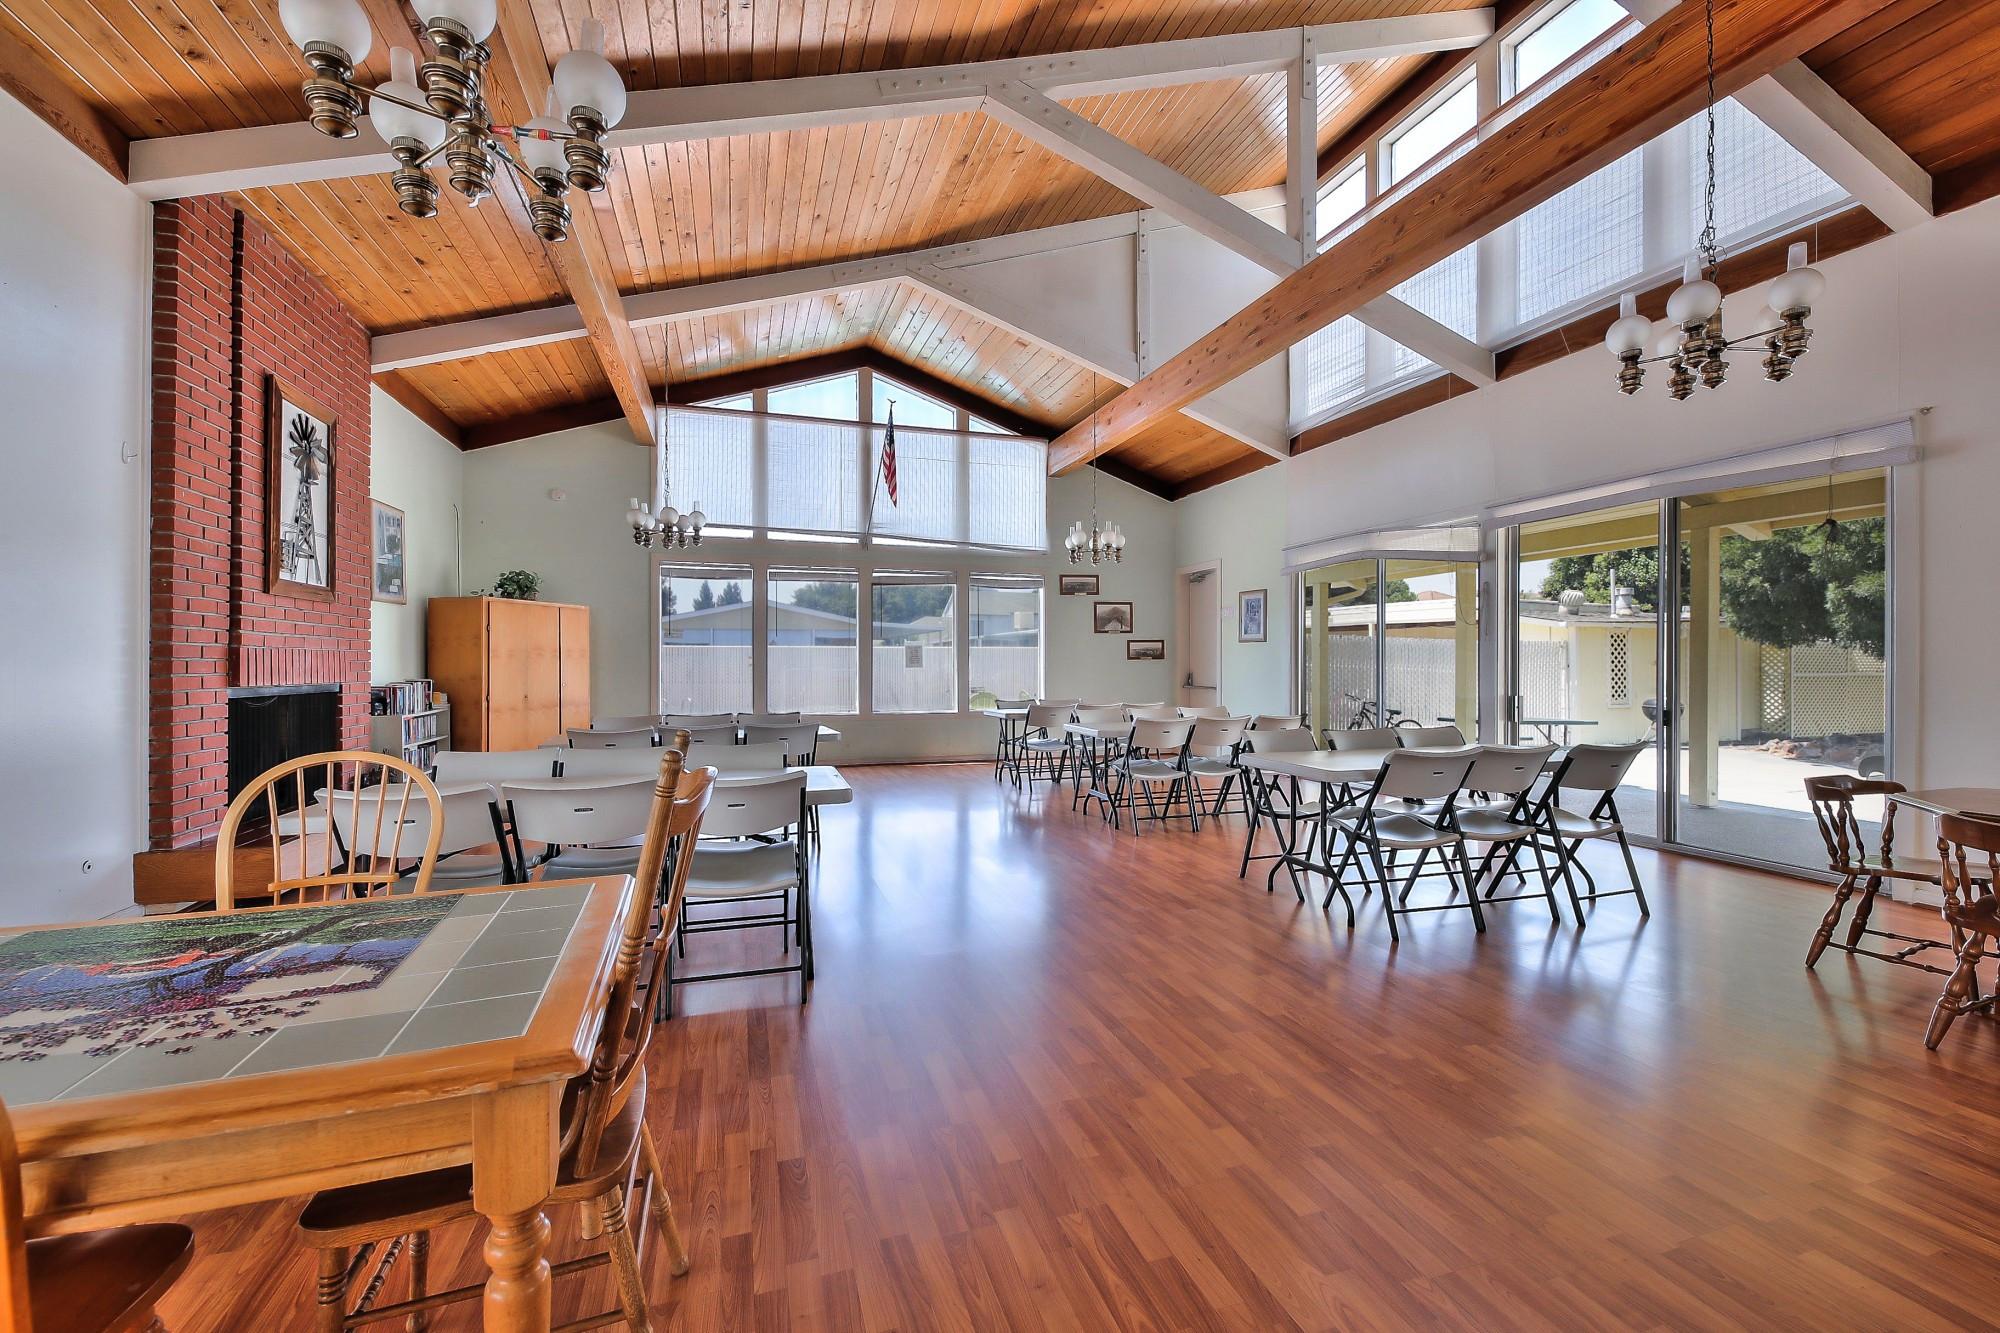 hardwood floor repair san jose ca of san jose real estate sunnyvale homes hayward investment property with regard to 575 san pedro ave morgan hill ca 95037